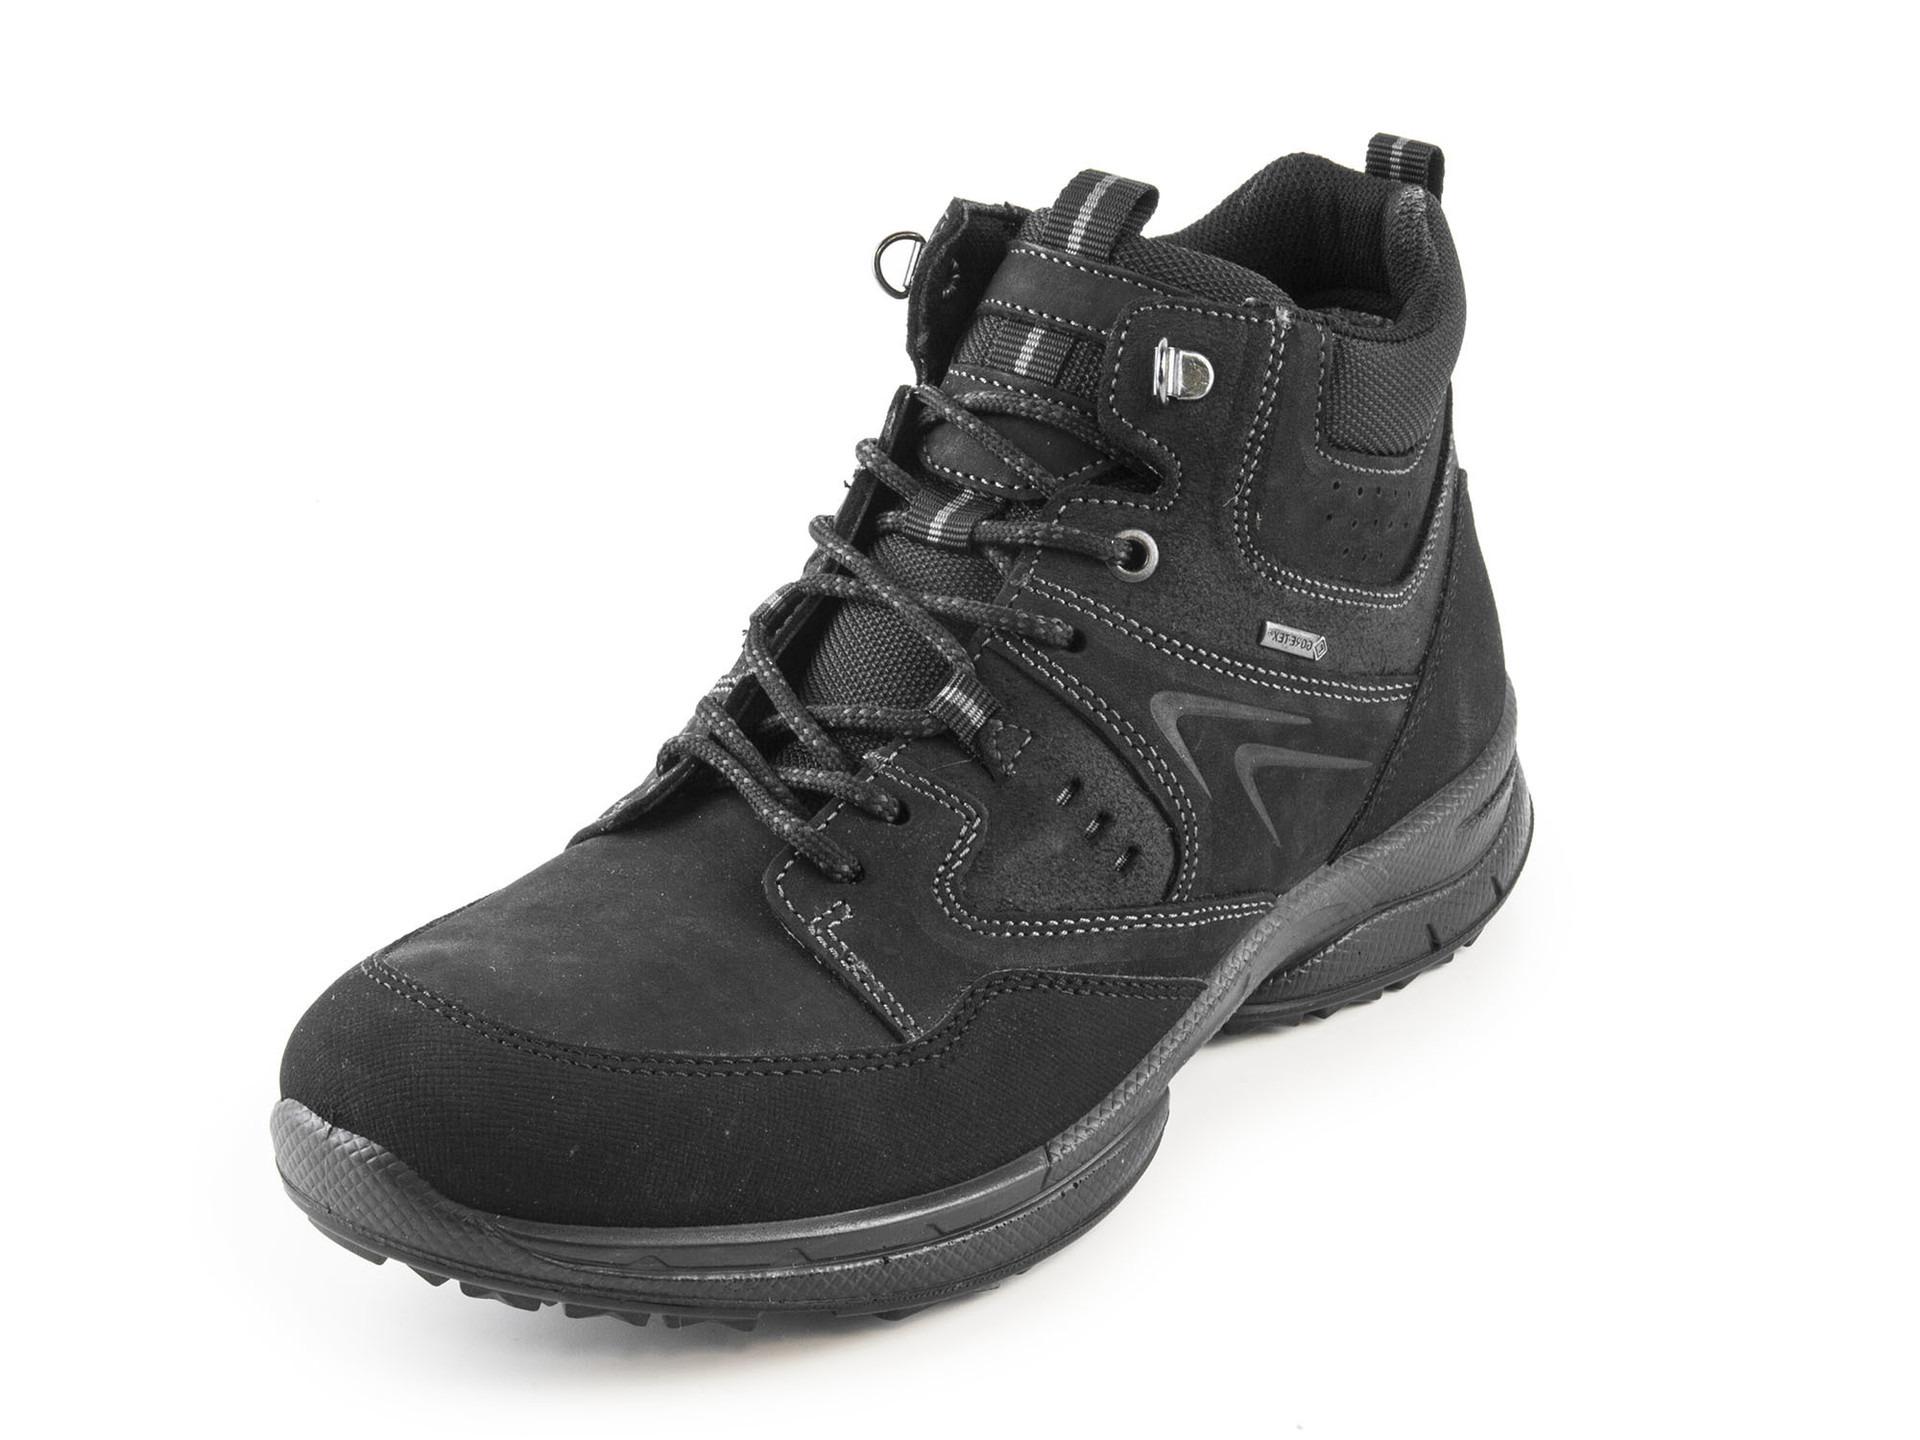 Soňa - Pánska obuv - Zimná - Ara men pánska Gore-texová obuv 18bb04796f7